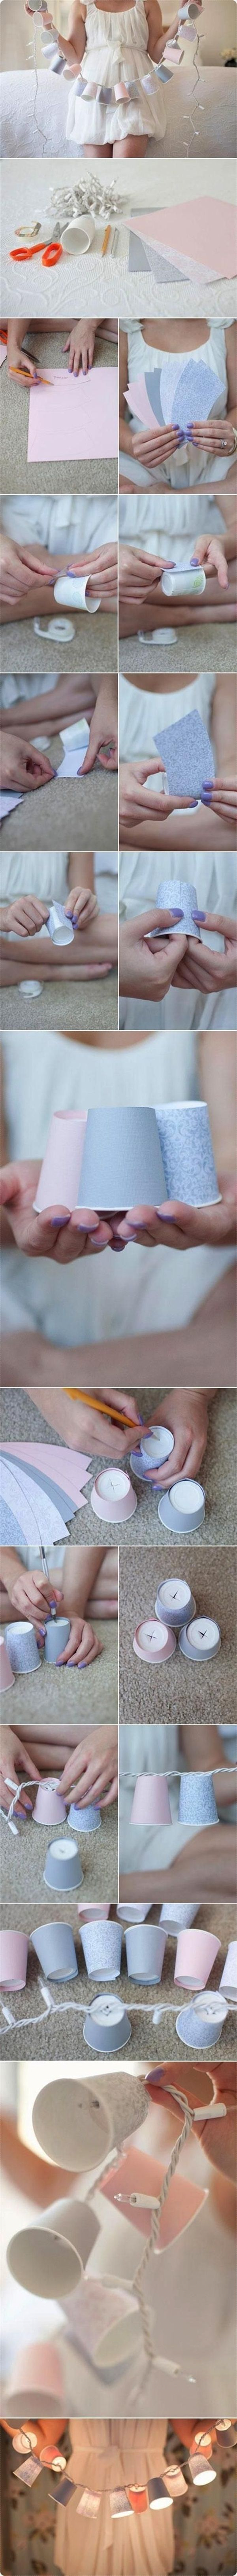 Paper Craft Ideas3